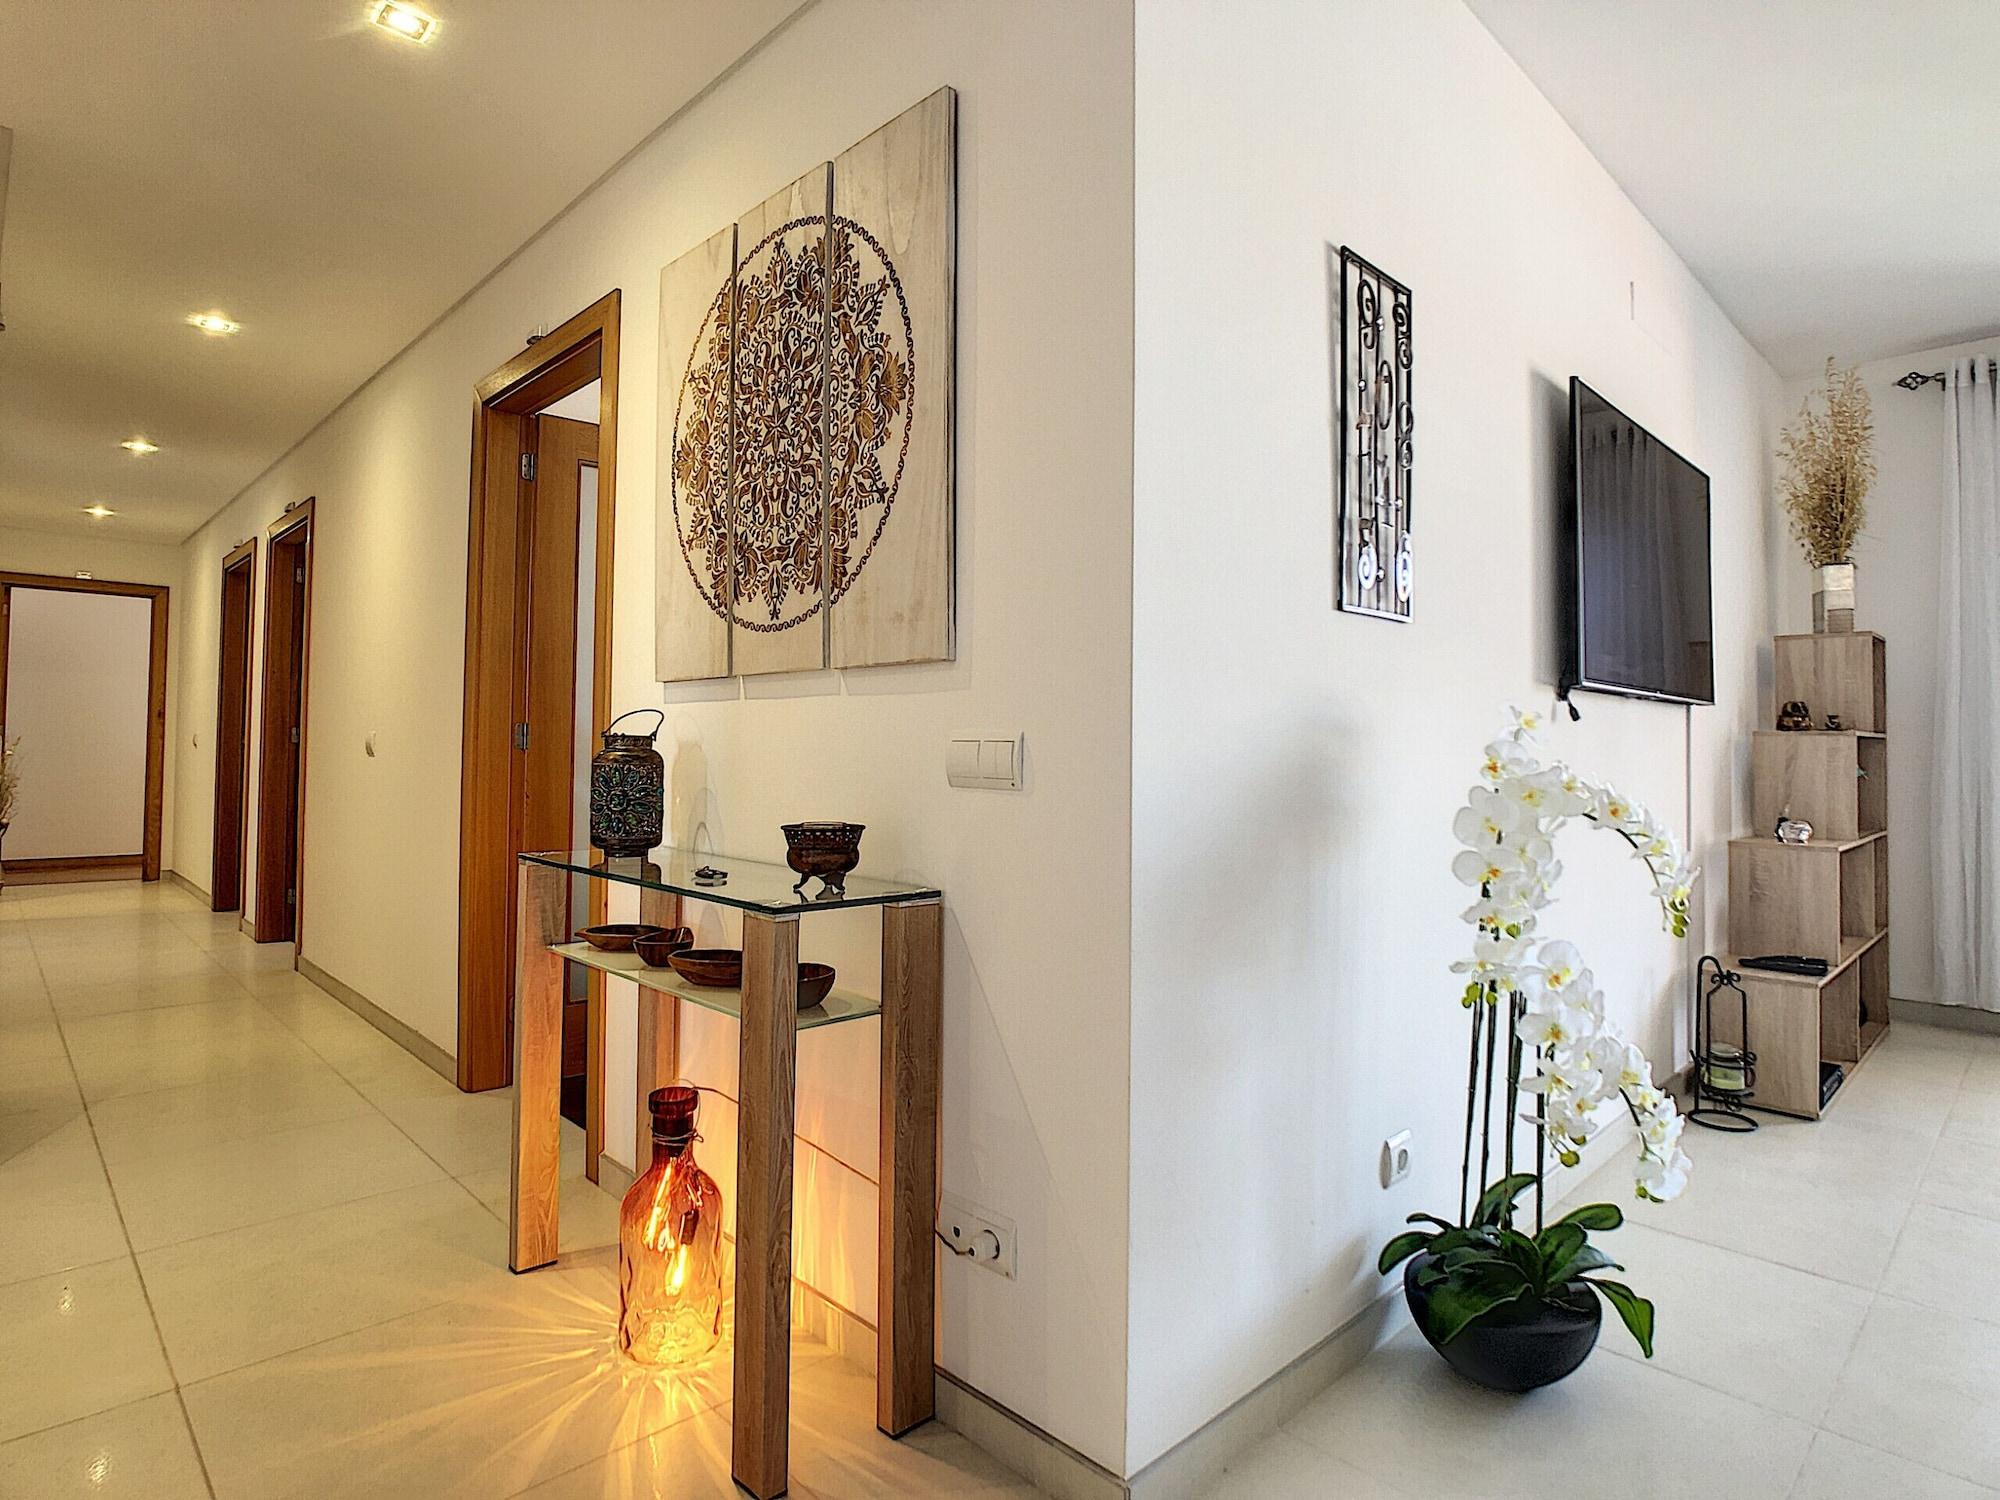 Apartamento Nata by MHM, Santa Cruz